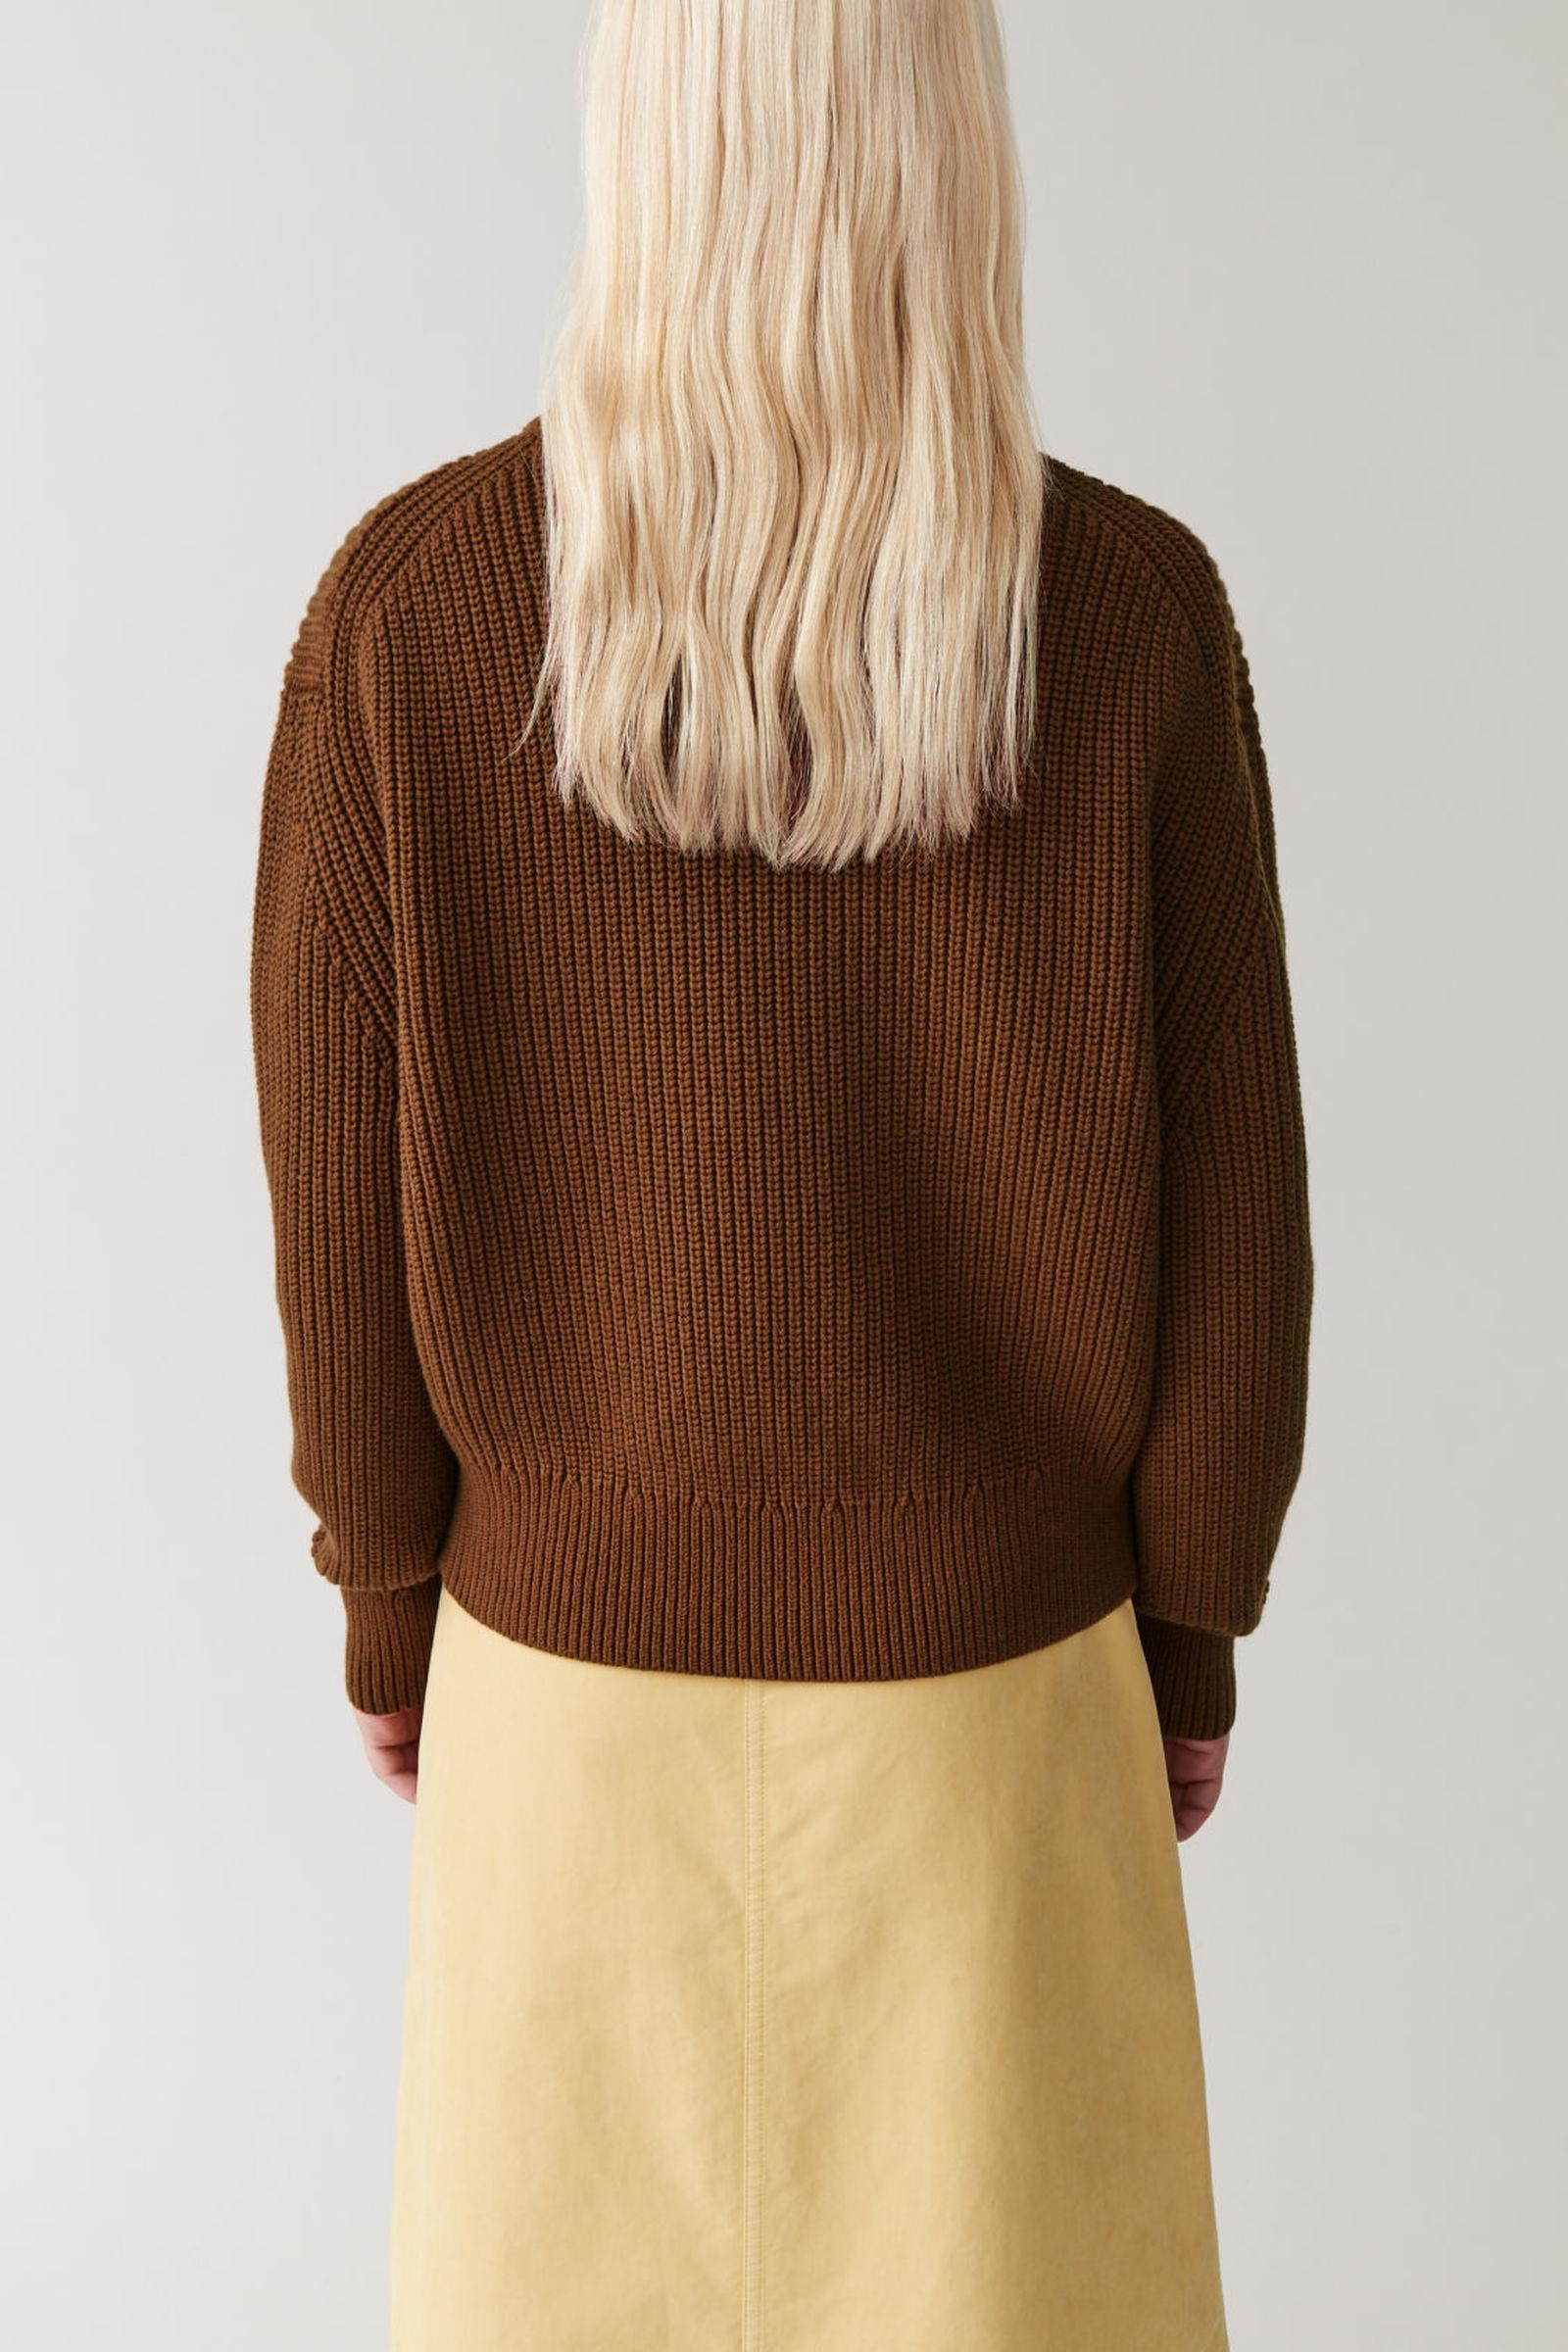 COS 청키 코튼 울 스웨터의 브라운컬러 ECOMLook입니다.